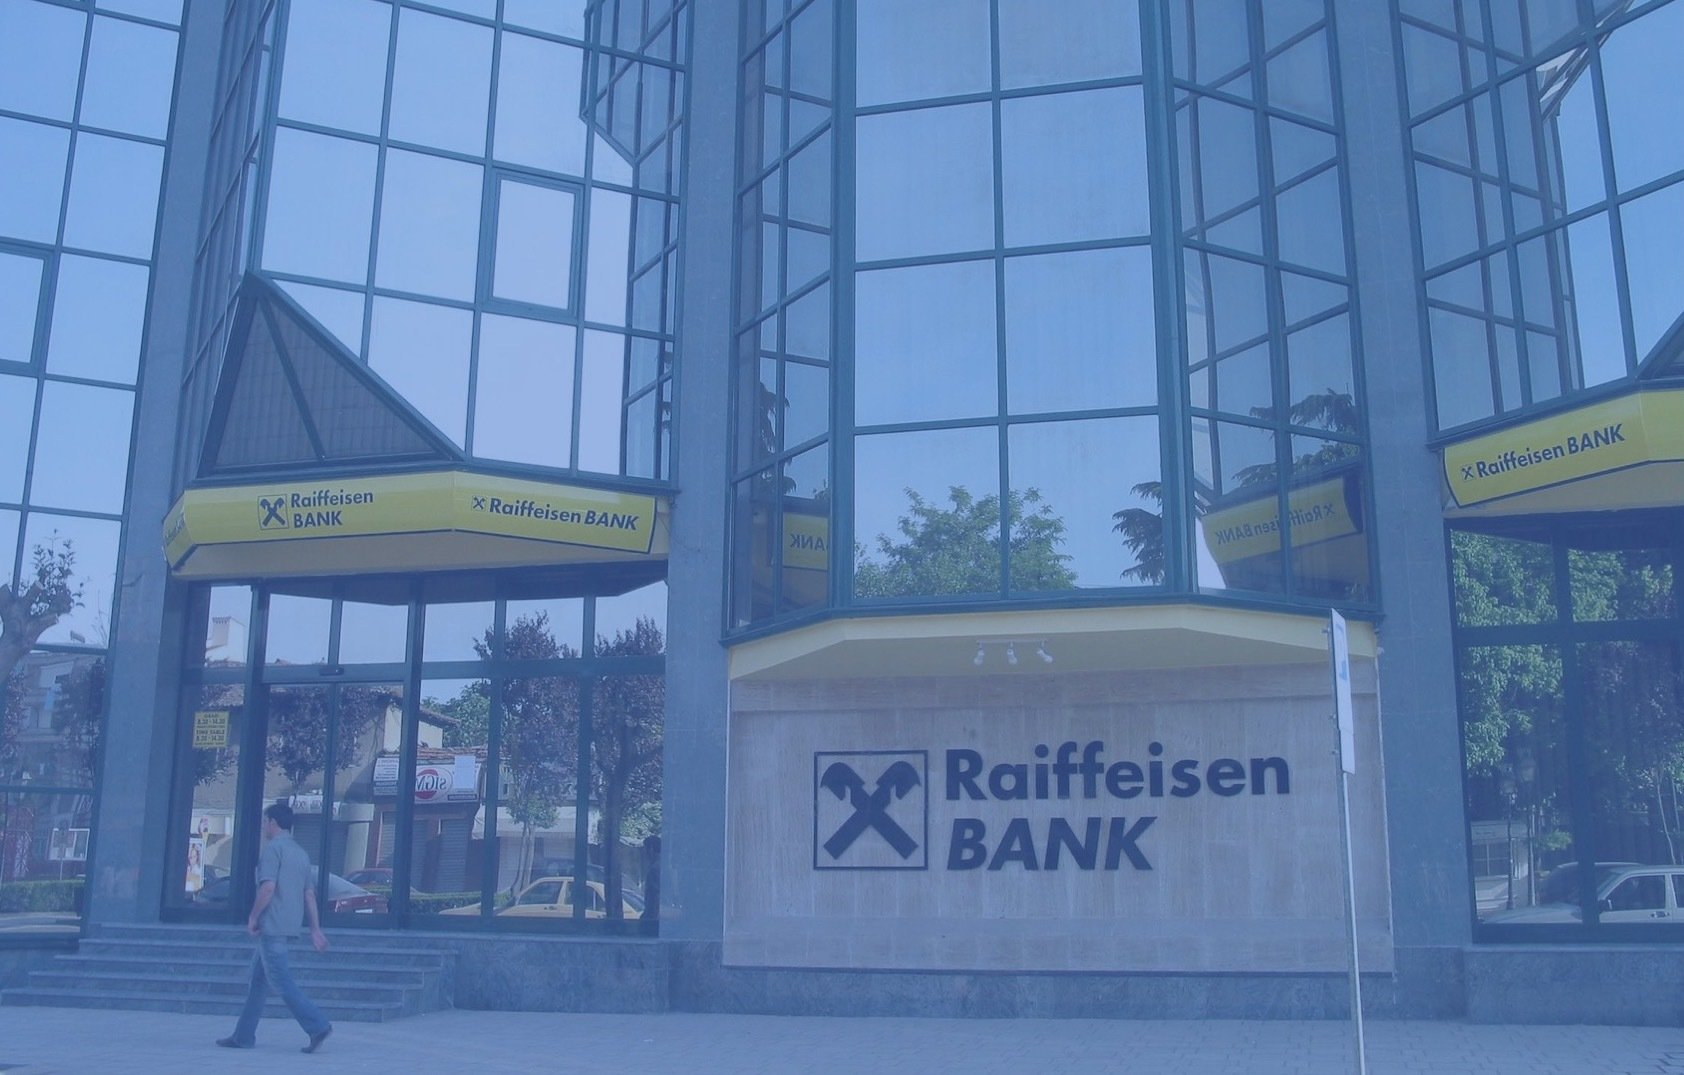 Kancelaria Rąpała dla Raiffeisen Bank Polska S.A.